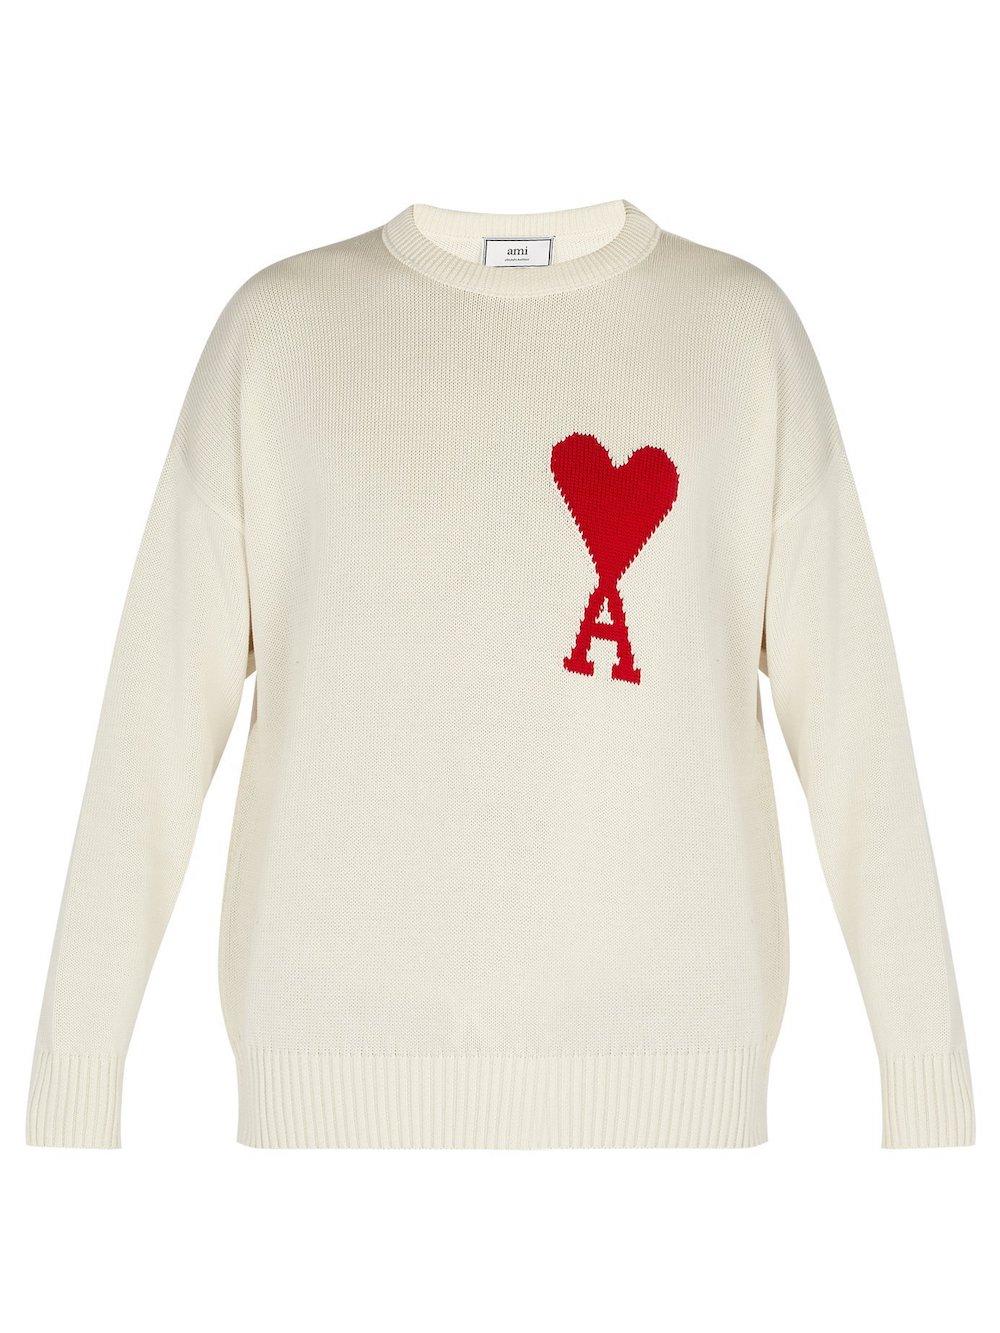 AMI Heart-intarsia cotton sweater